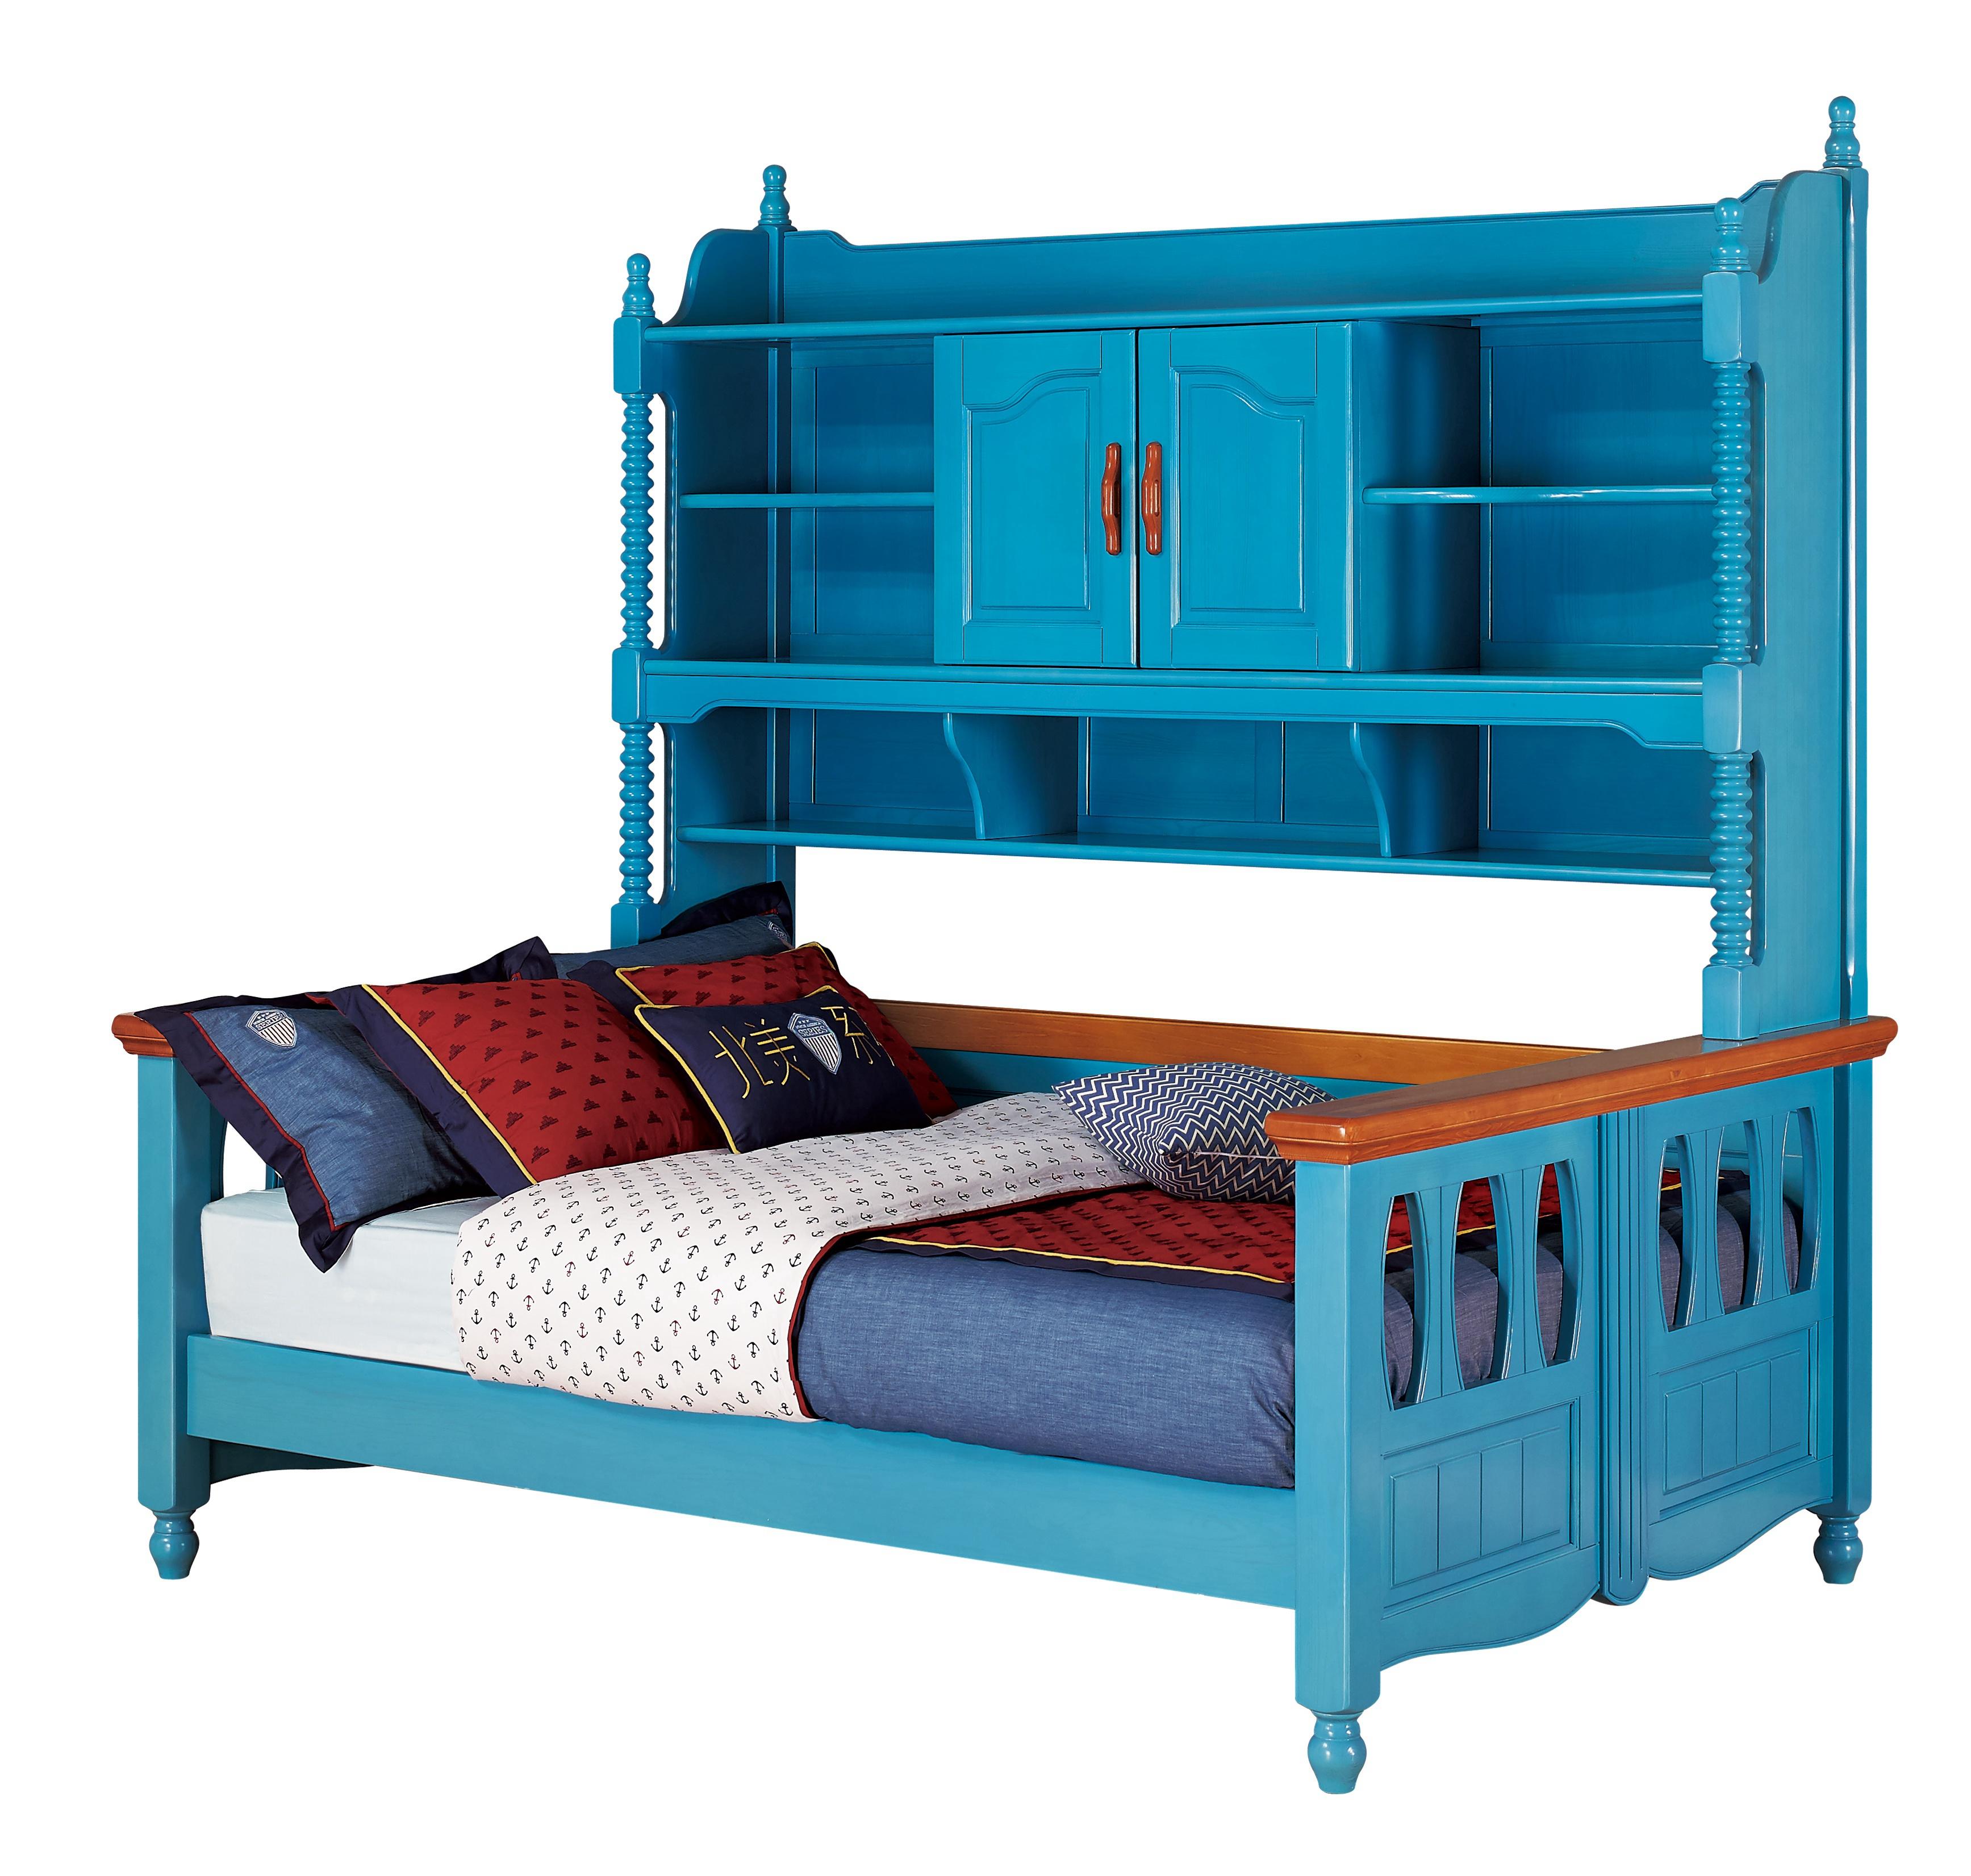 Beliches Com Colchões De Cama Castelo Caravana Preço Barato Buy Cheap Bunk Beds With Mattresses Castle Bunk Bed Caravan Bunk Bed Product On Alibaba Com